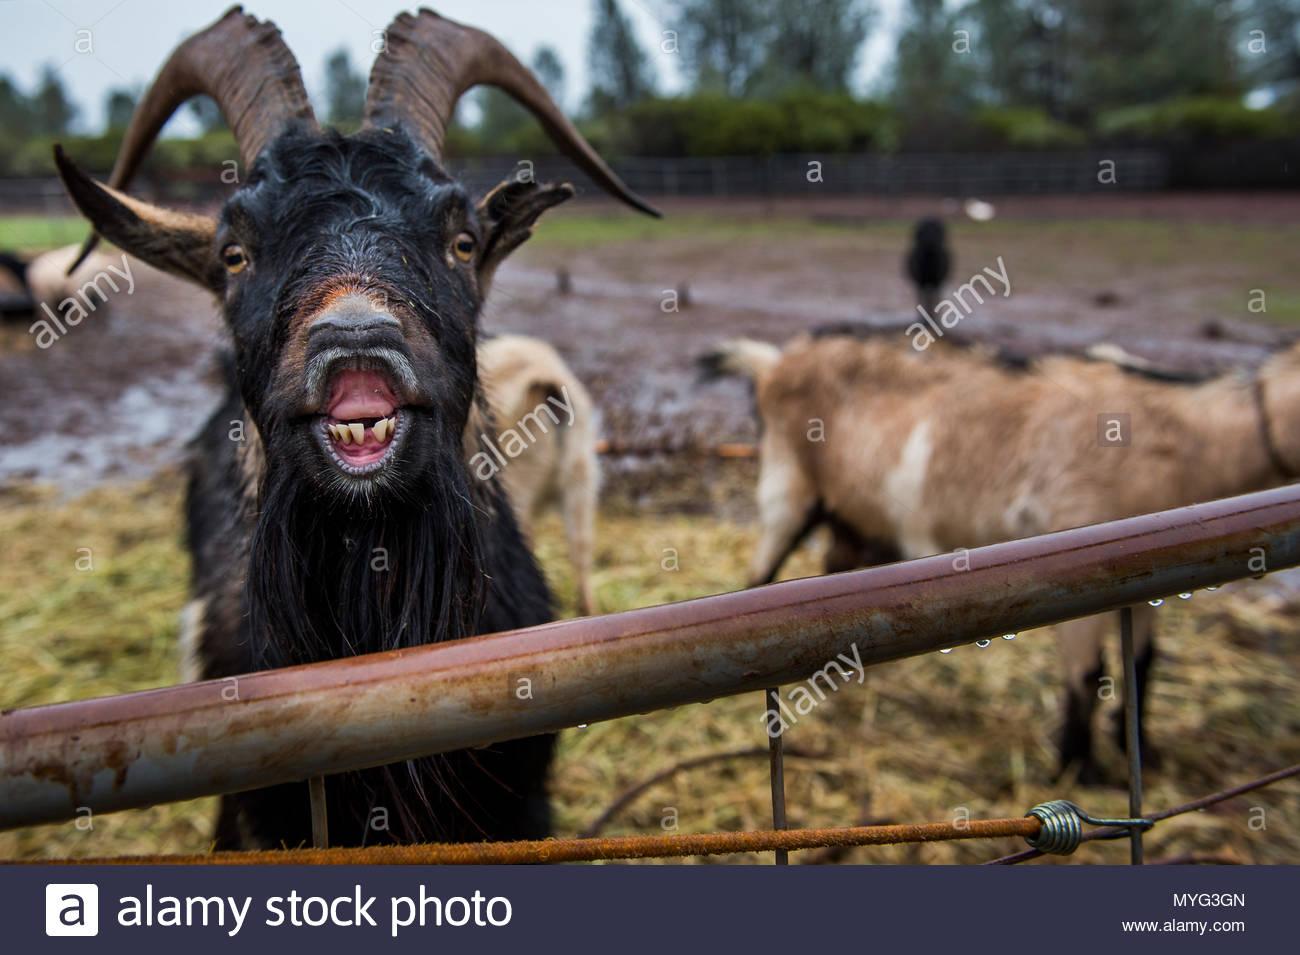 A goat bleats on a farm. - Stock Image